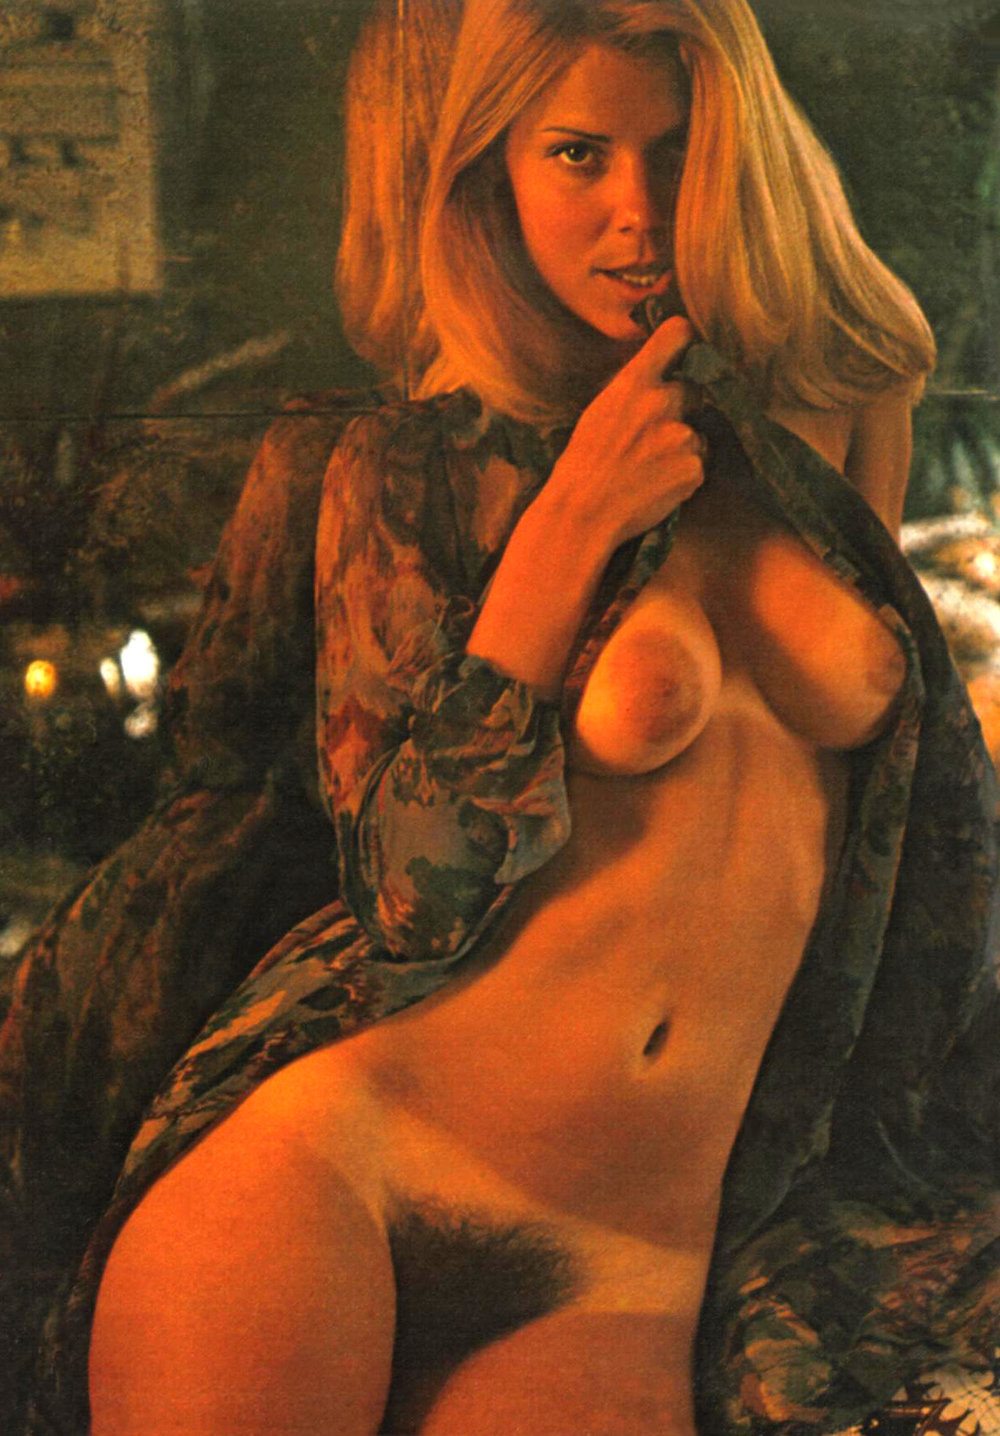 Kristine Hanson Playboy Magazine 1974 12.jpg